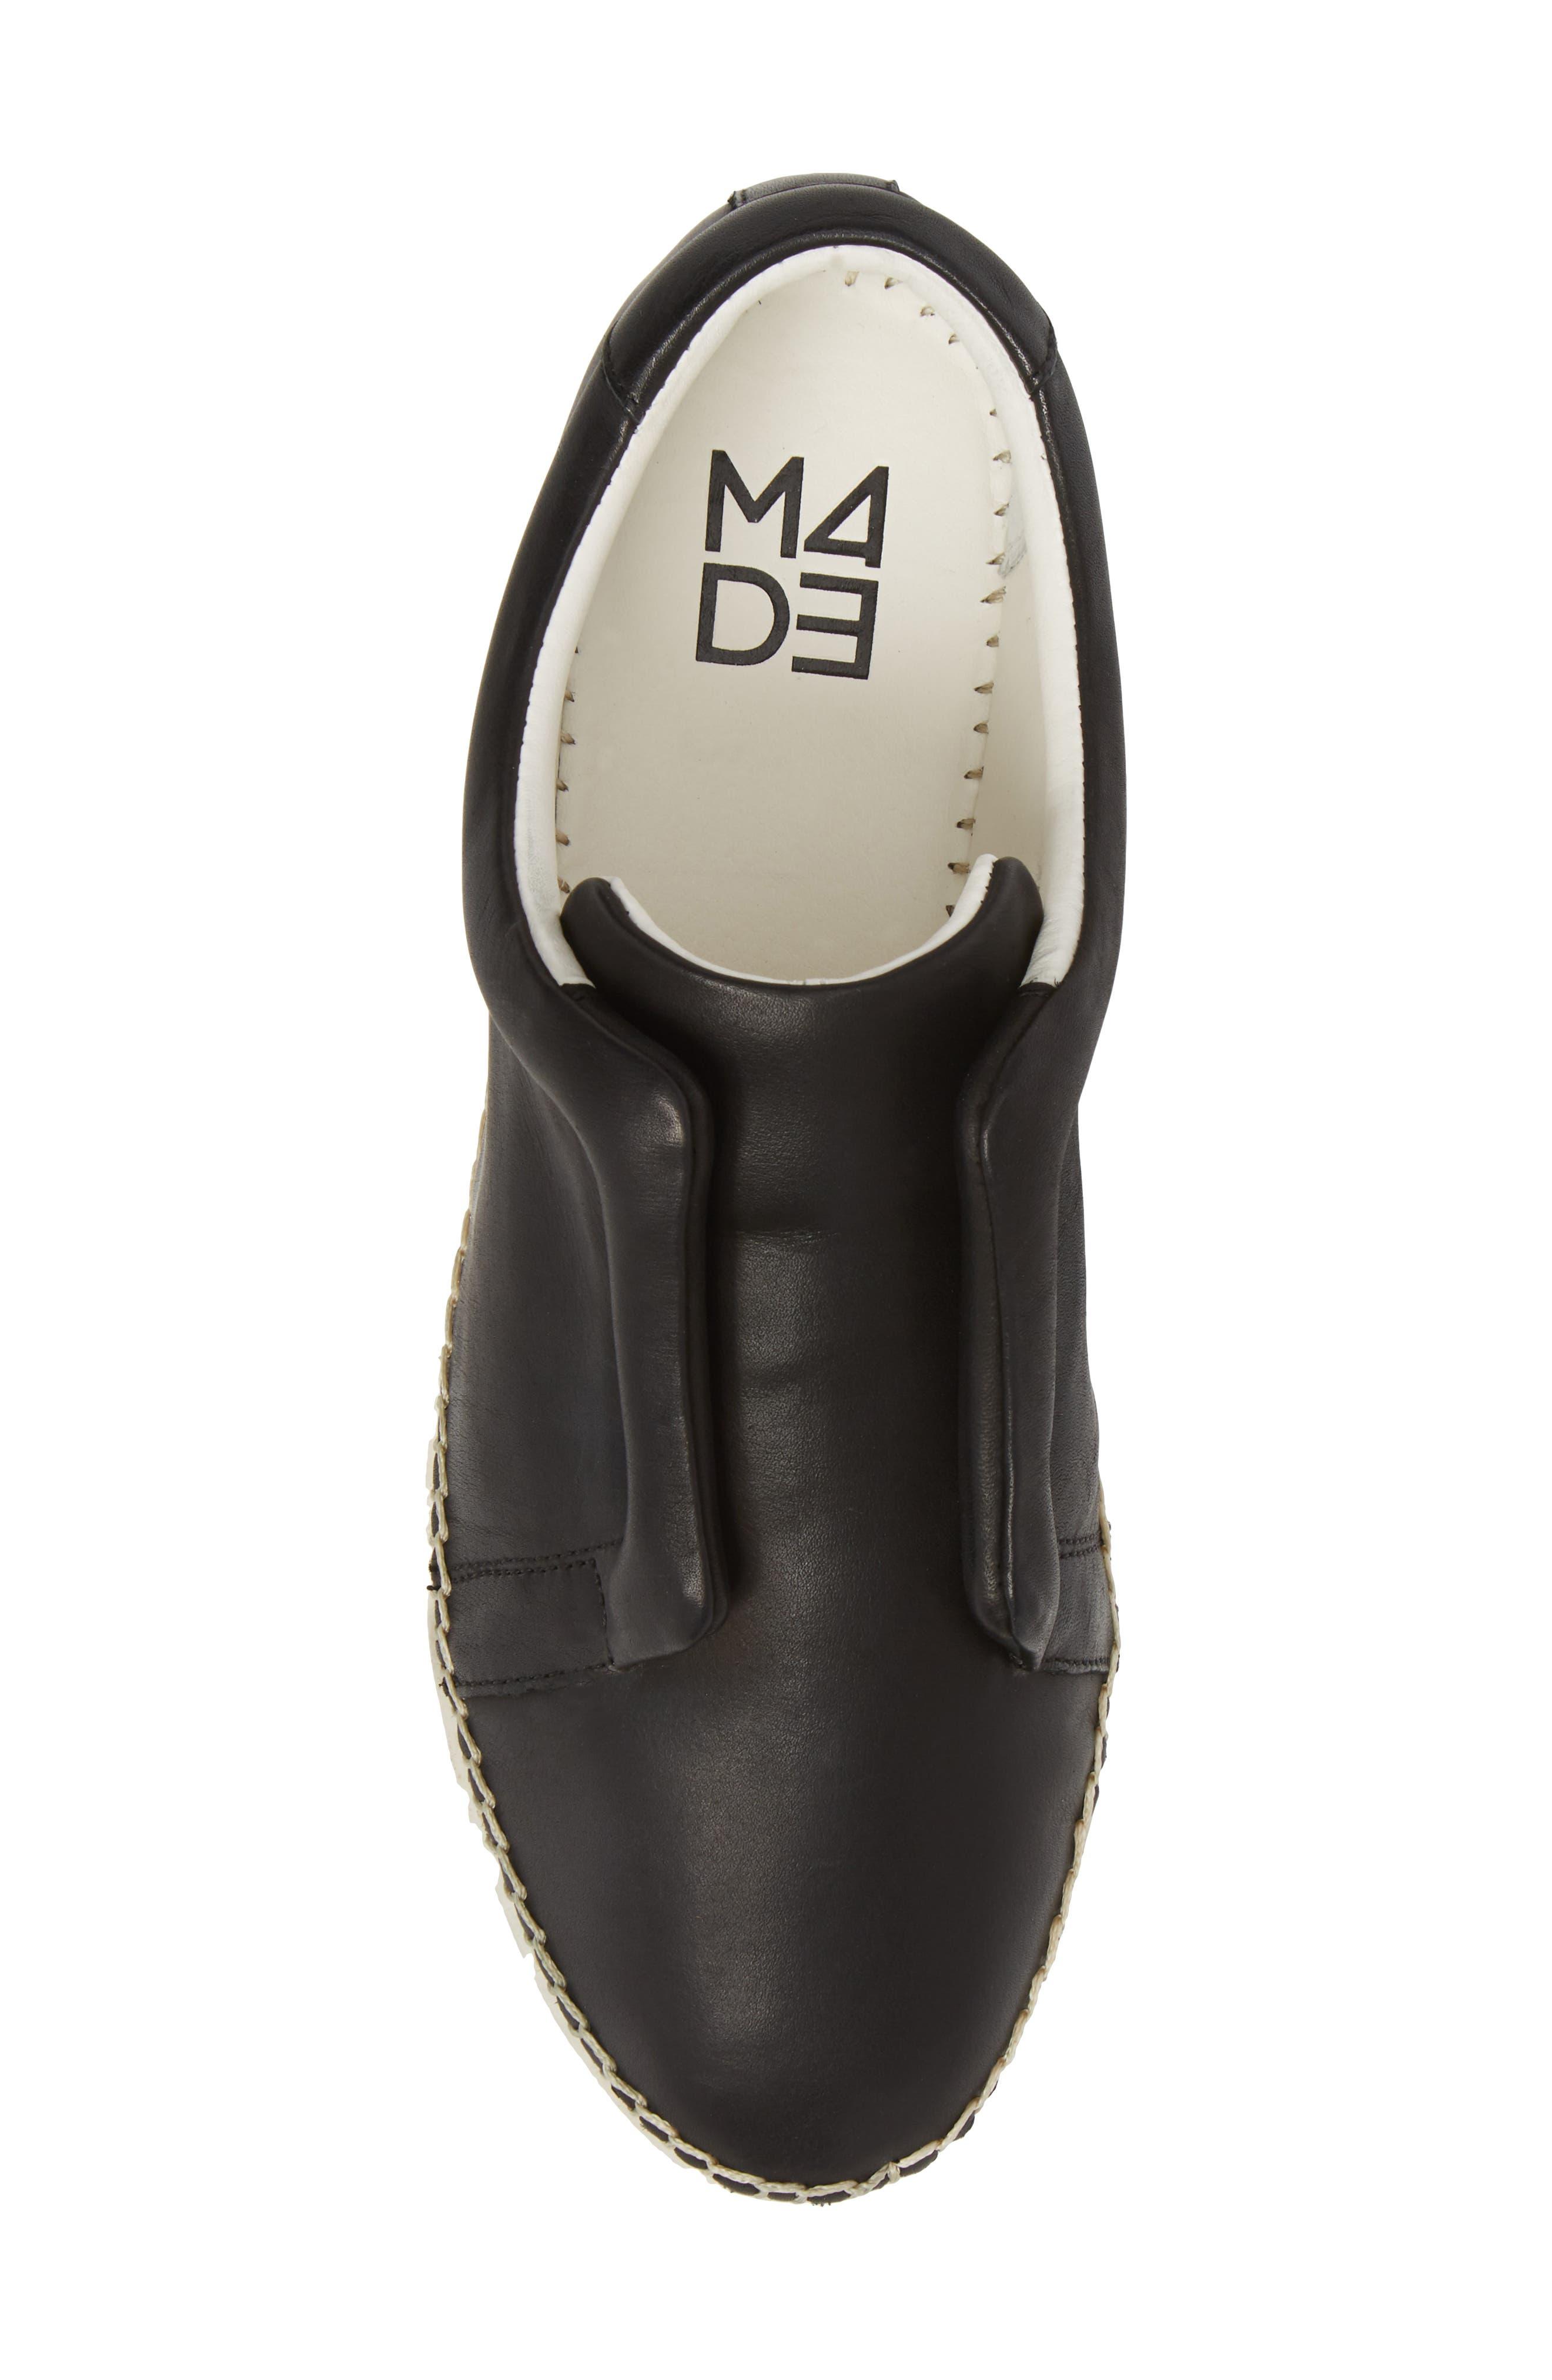 M4D3 Elizabeth Espadrille Slip-On Sneaker,                             Alternate thumbnail 5, color,                             Black Leather